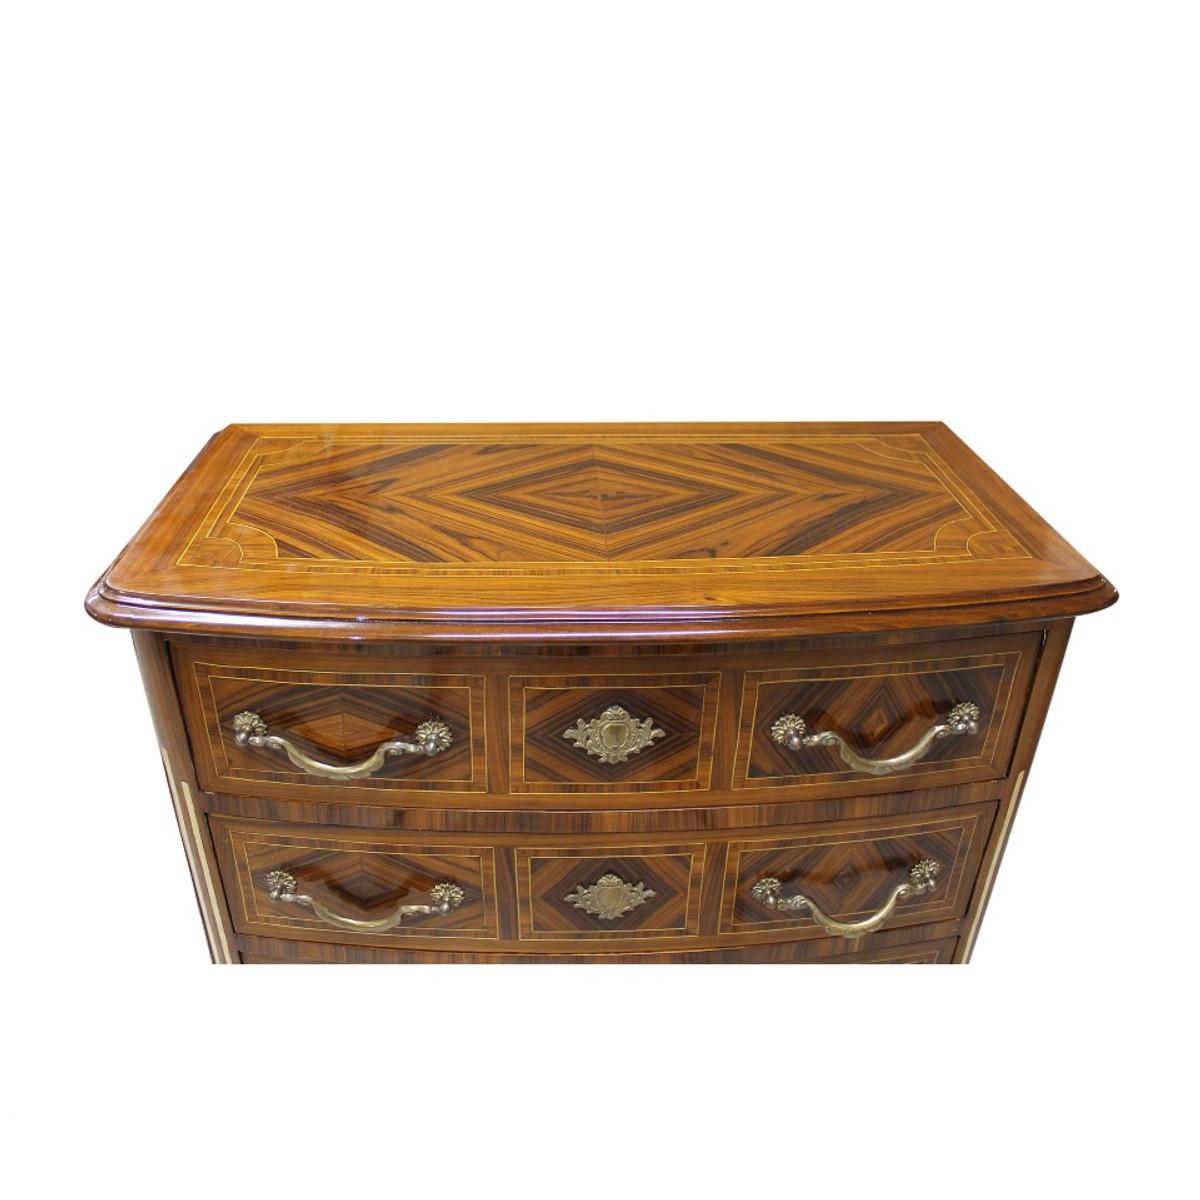 casa padrino barock kommode mit 4 schubladen 80 x 40 x h 85 cm antik m bel kommoden barock. Black Bedroom Furniture Sets. Home Design Ideas